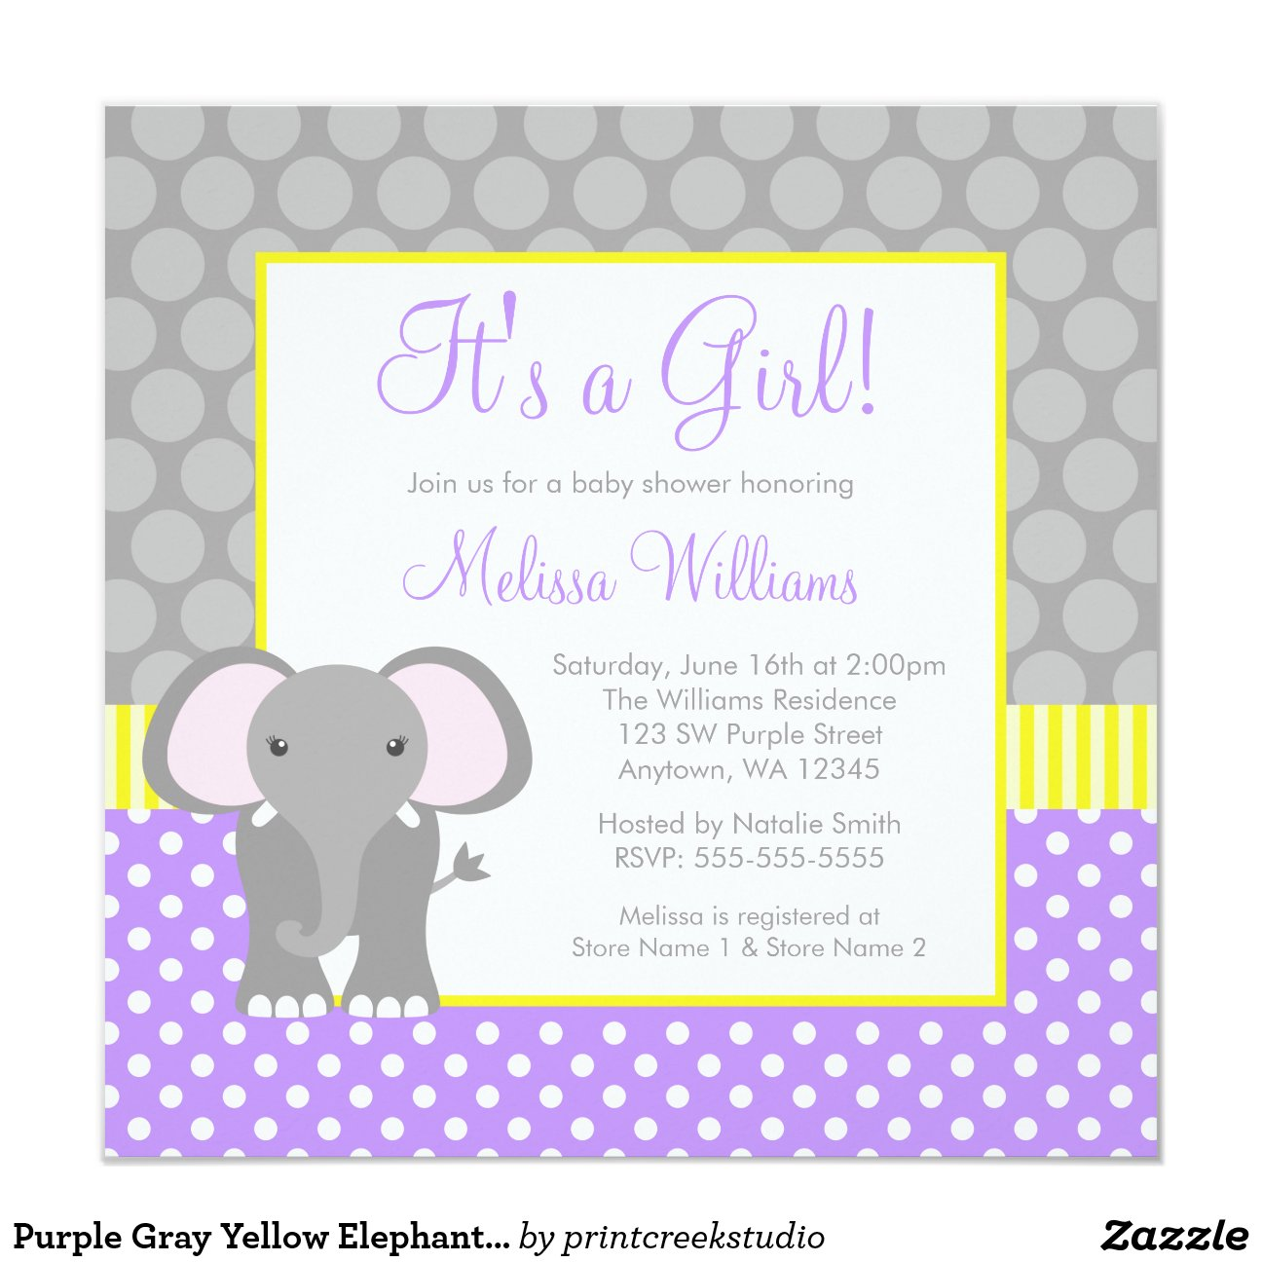 Yellow Elephant Baby Shower Invitations was Nice Sample To Make Fresh Invitations Layout